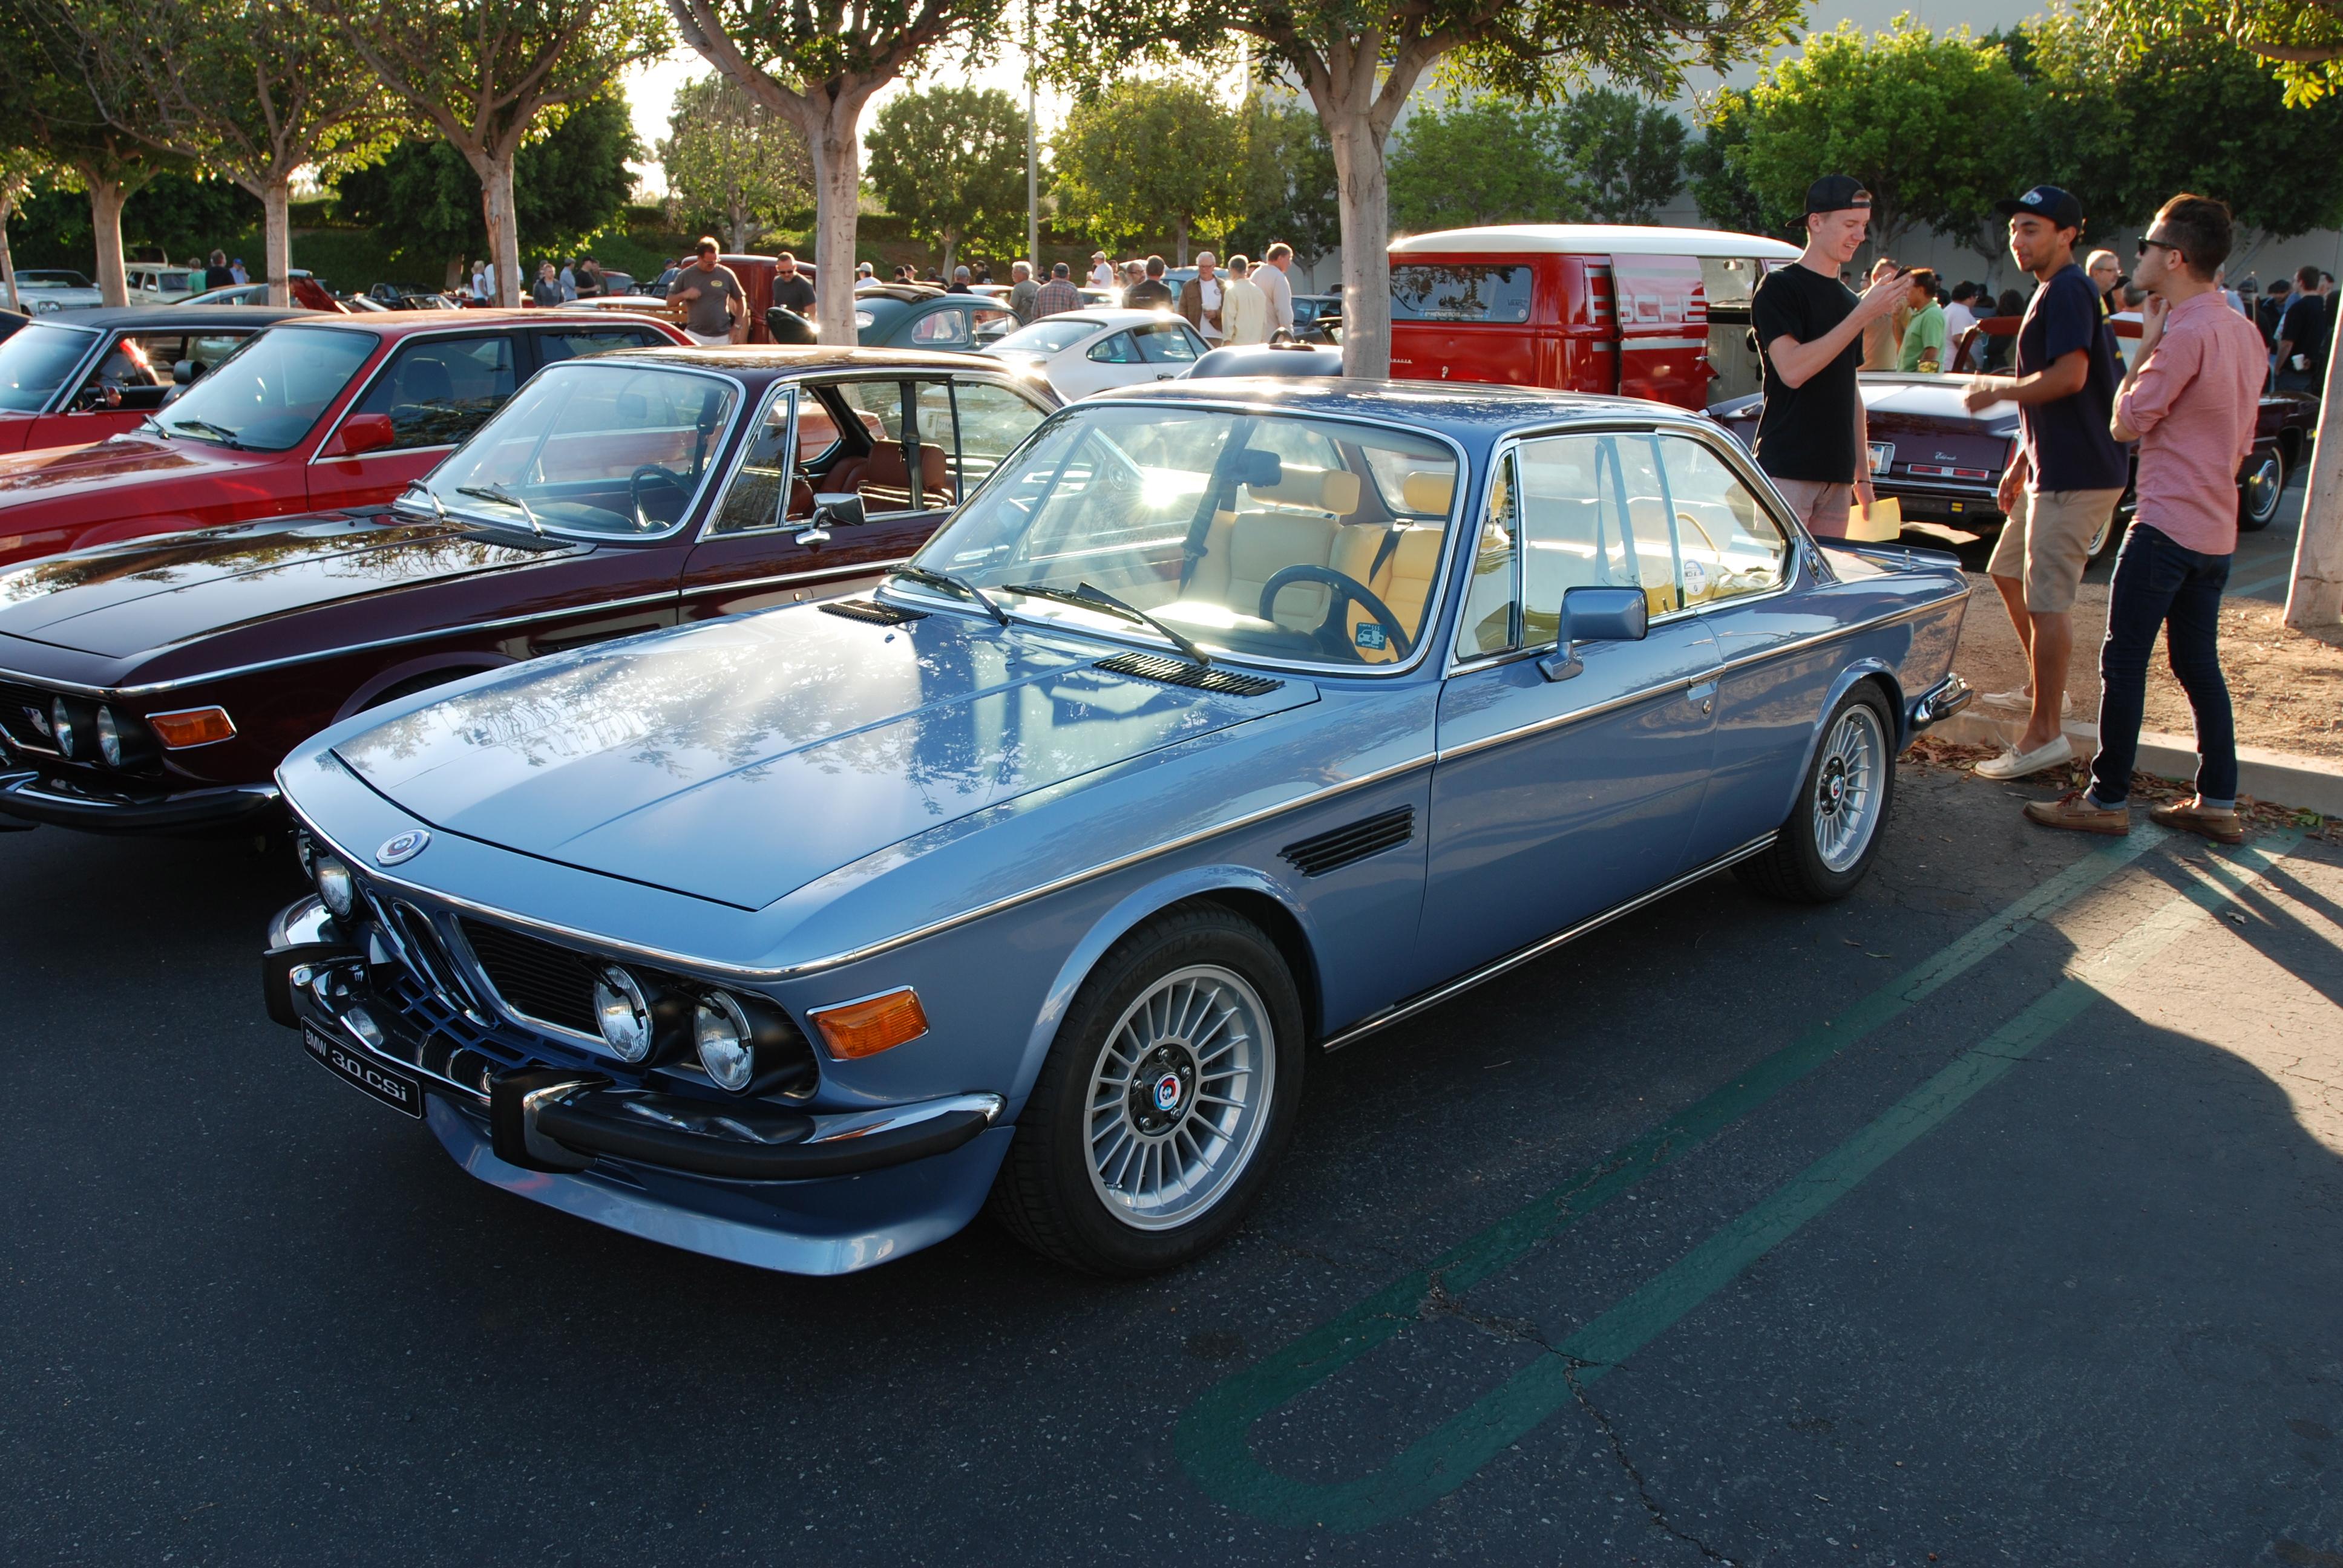 BMW 3.0 Csl >> BMW 3.0CSI   digitaldtour